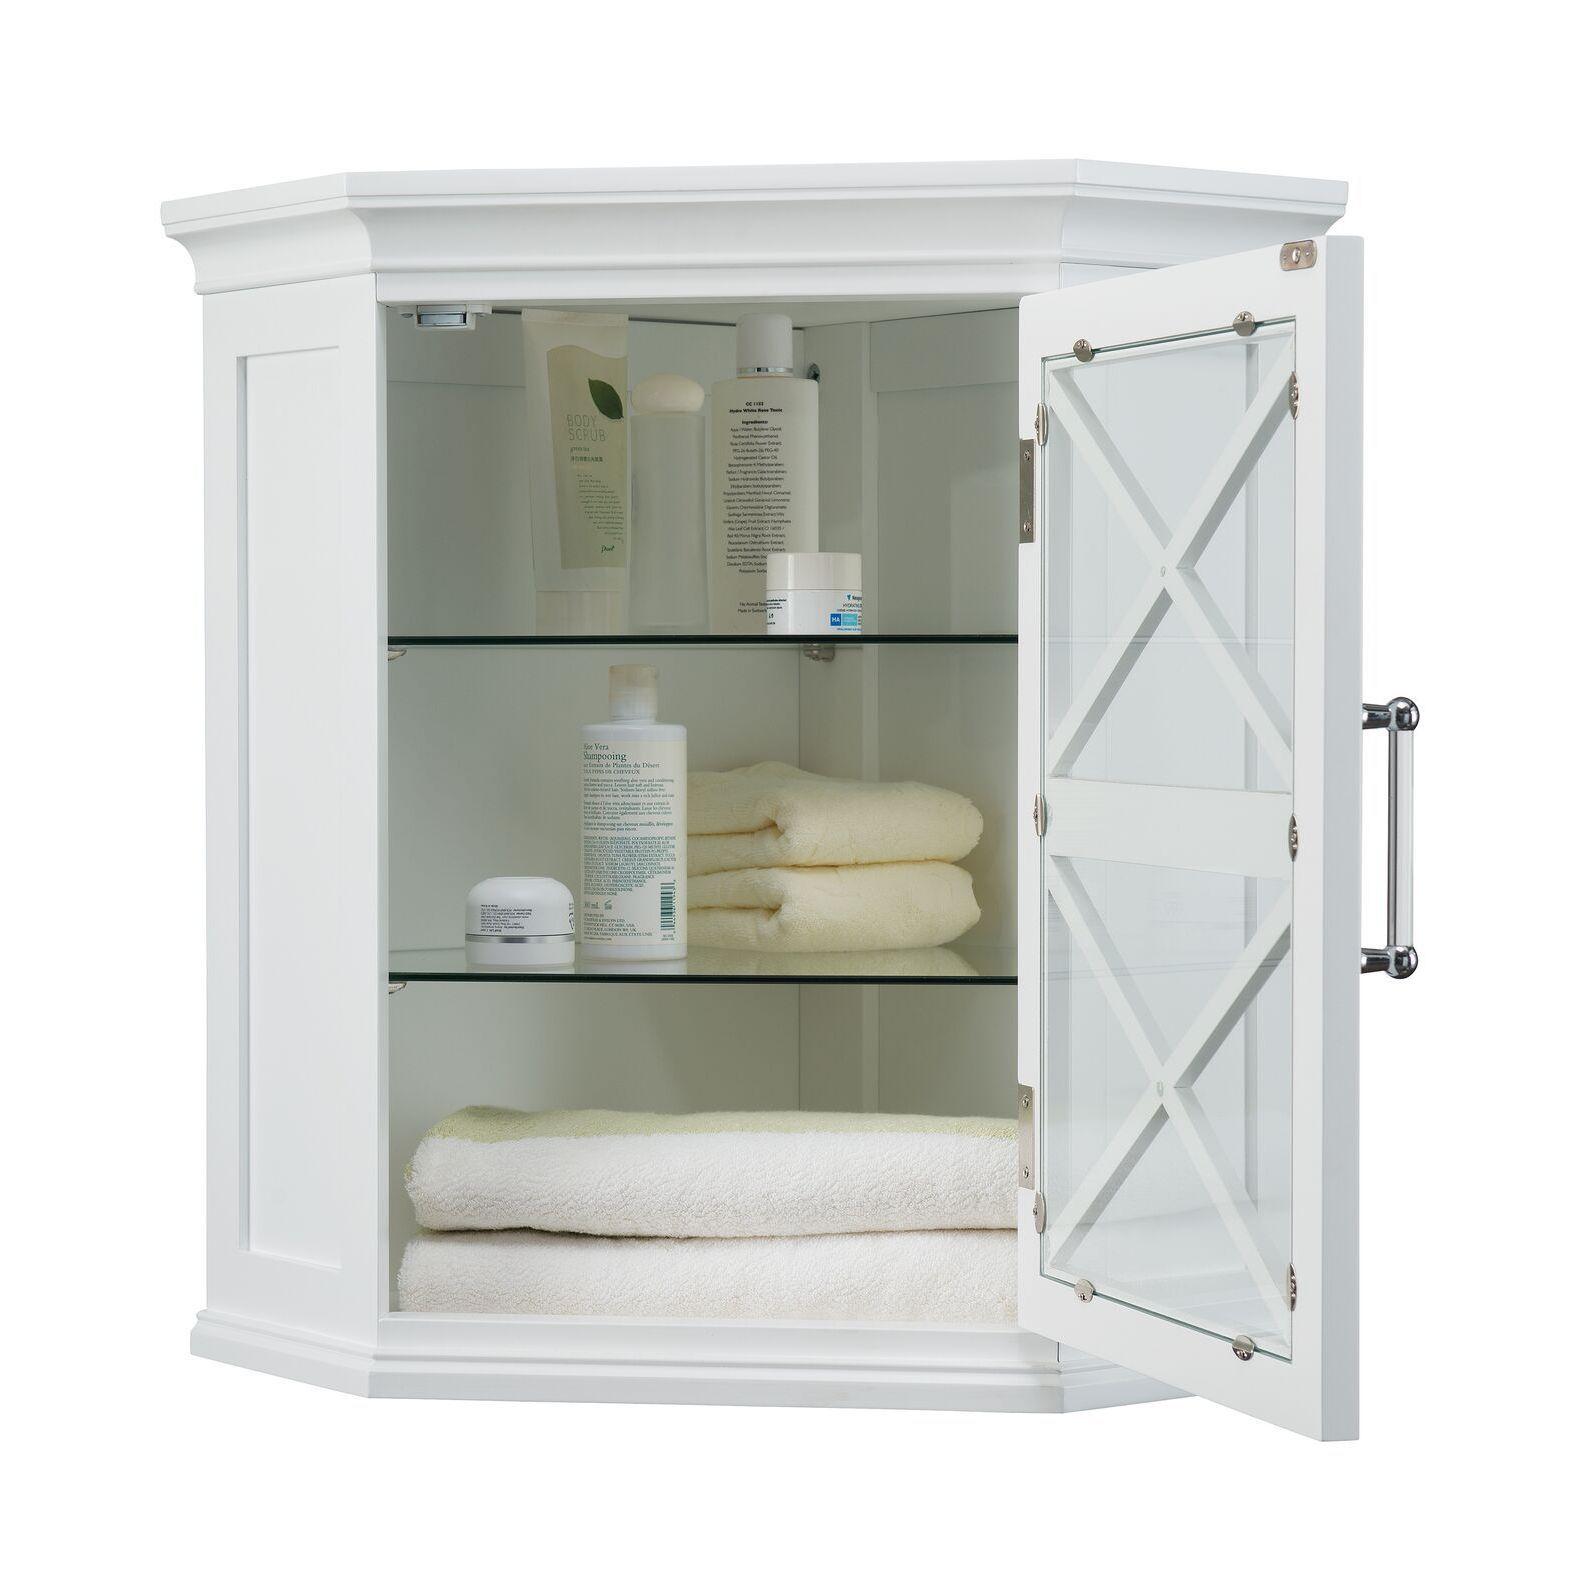 Bathroom Cabinet // Bathroom Storage Cabinet Grayson White Corner Wall Cabinet in Modern Style.